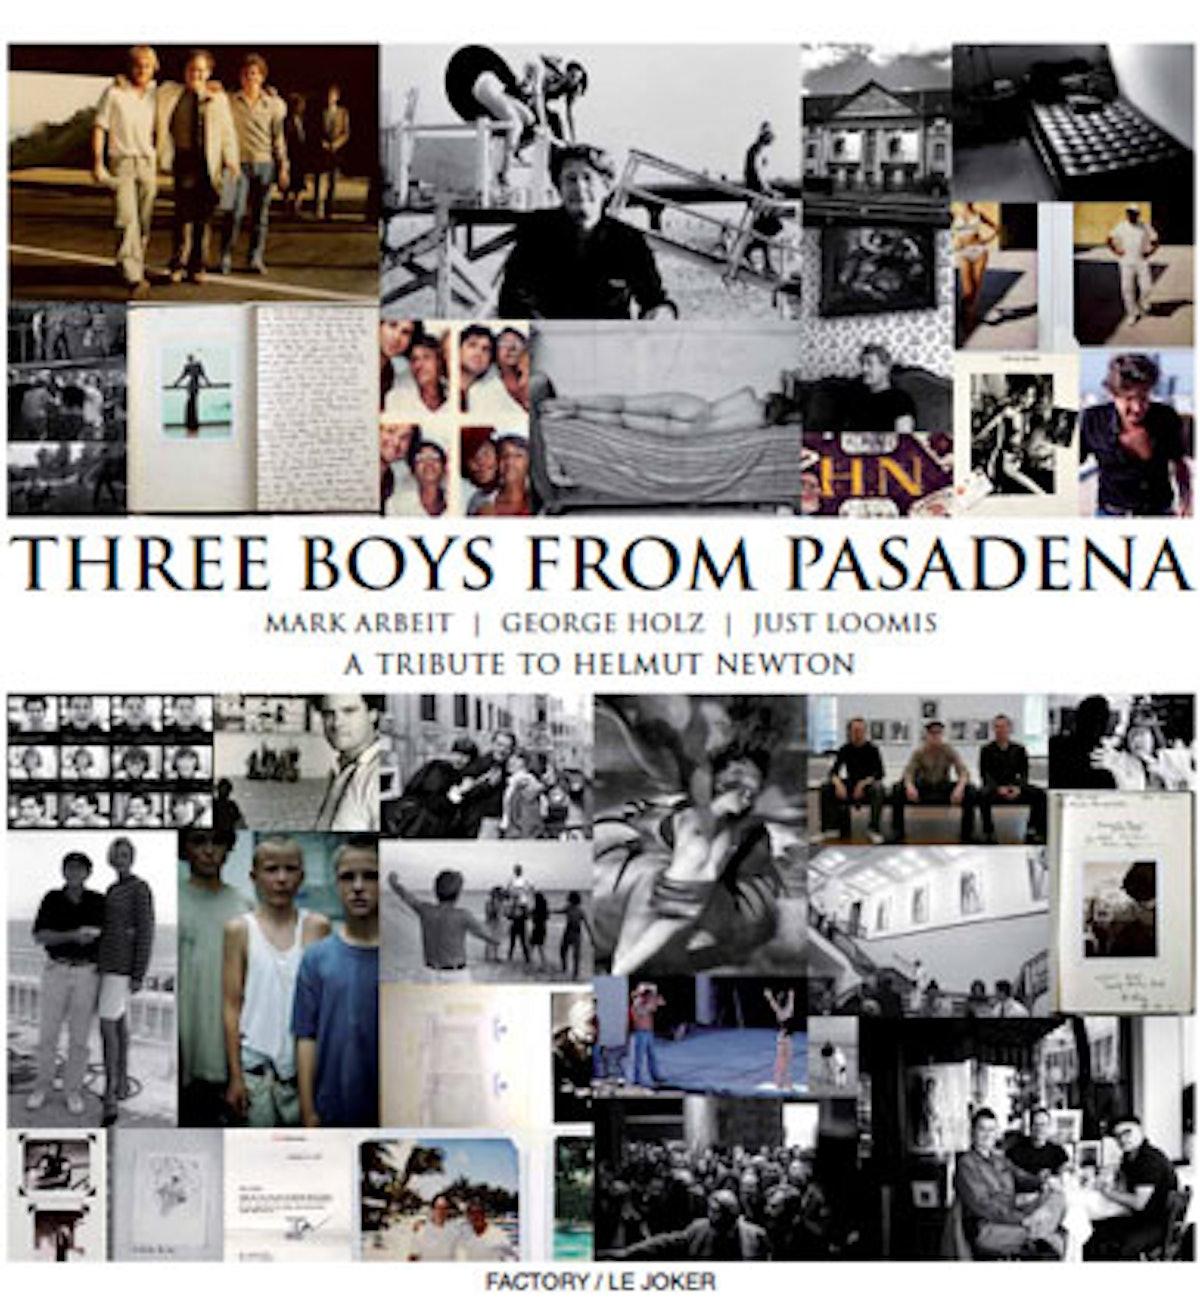 blog_three_boys_from_pasadena_a_tribute_to_helmut_newton.jpg